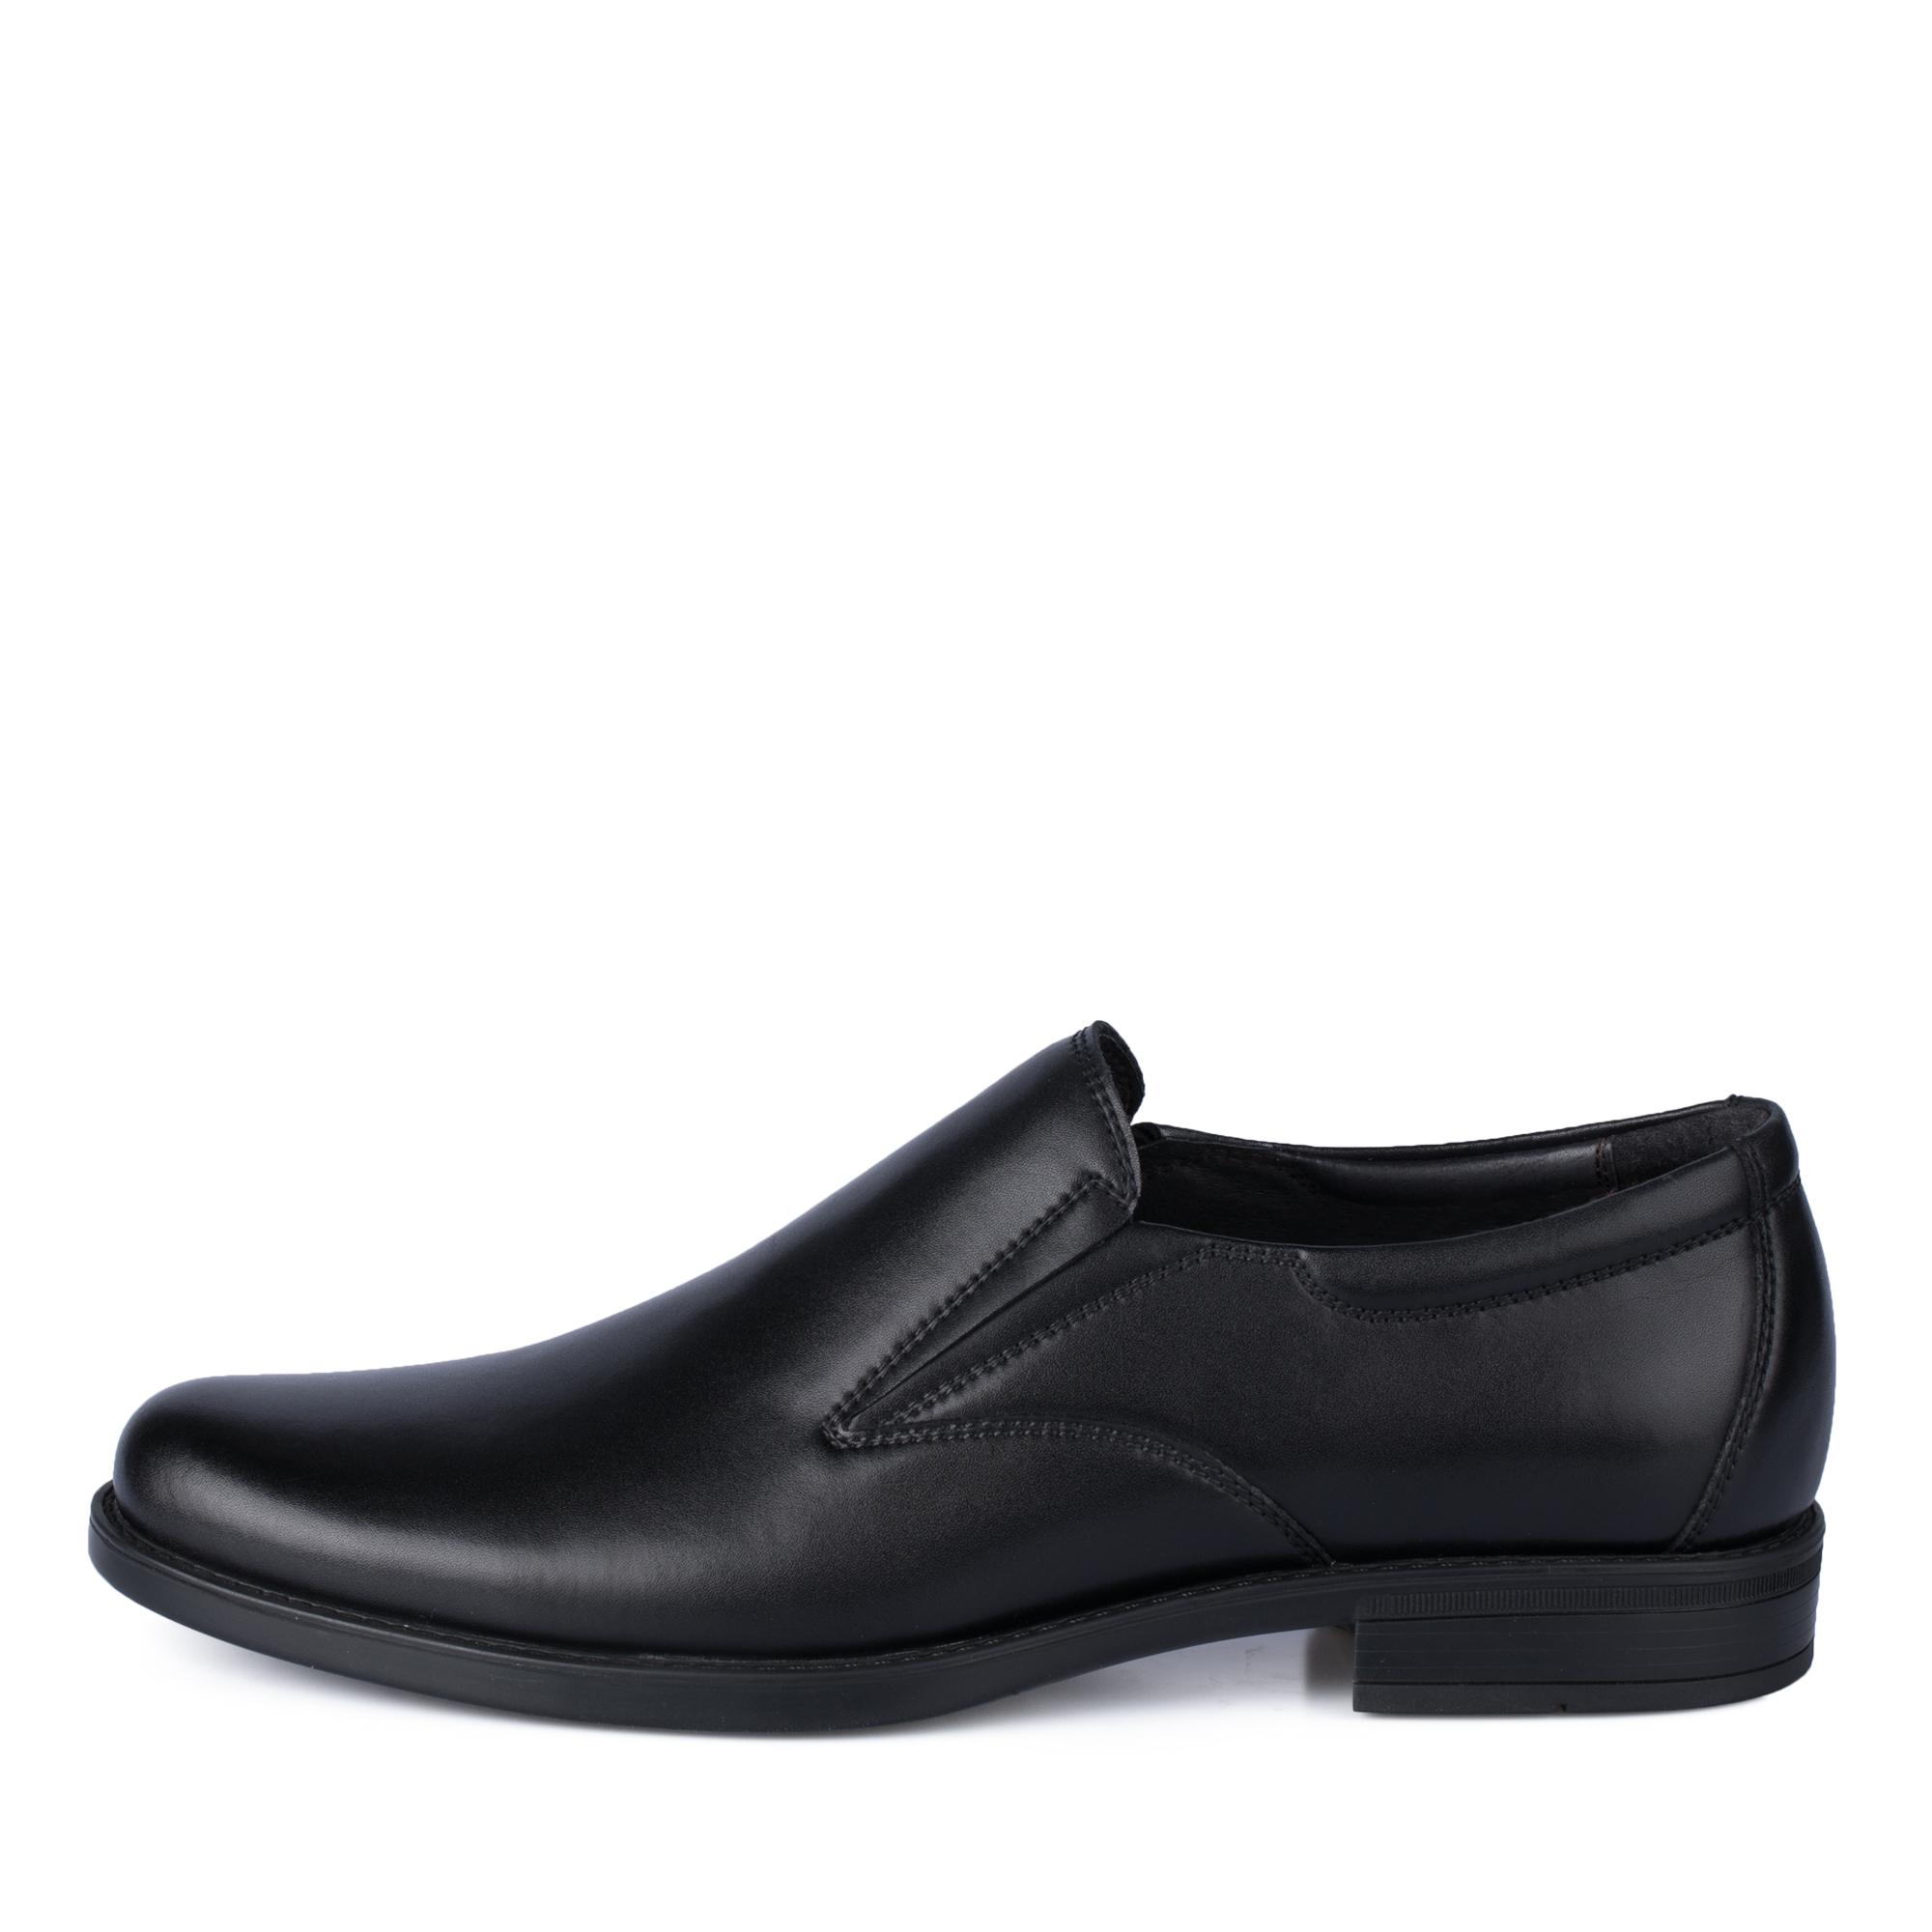 Туфли/полуботинки Thomas Munz 058-843A-1602